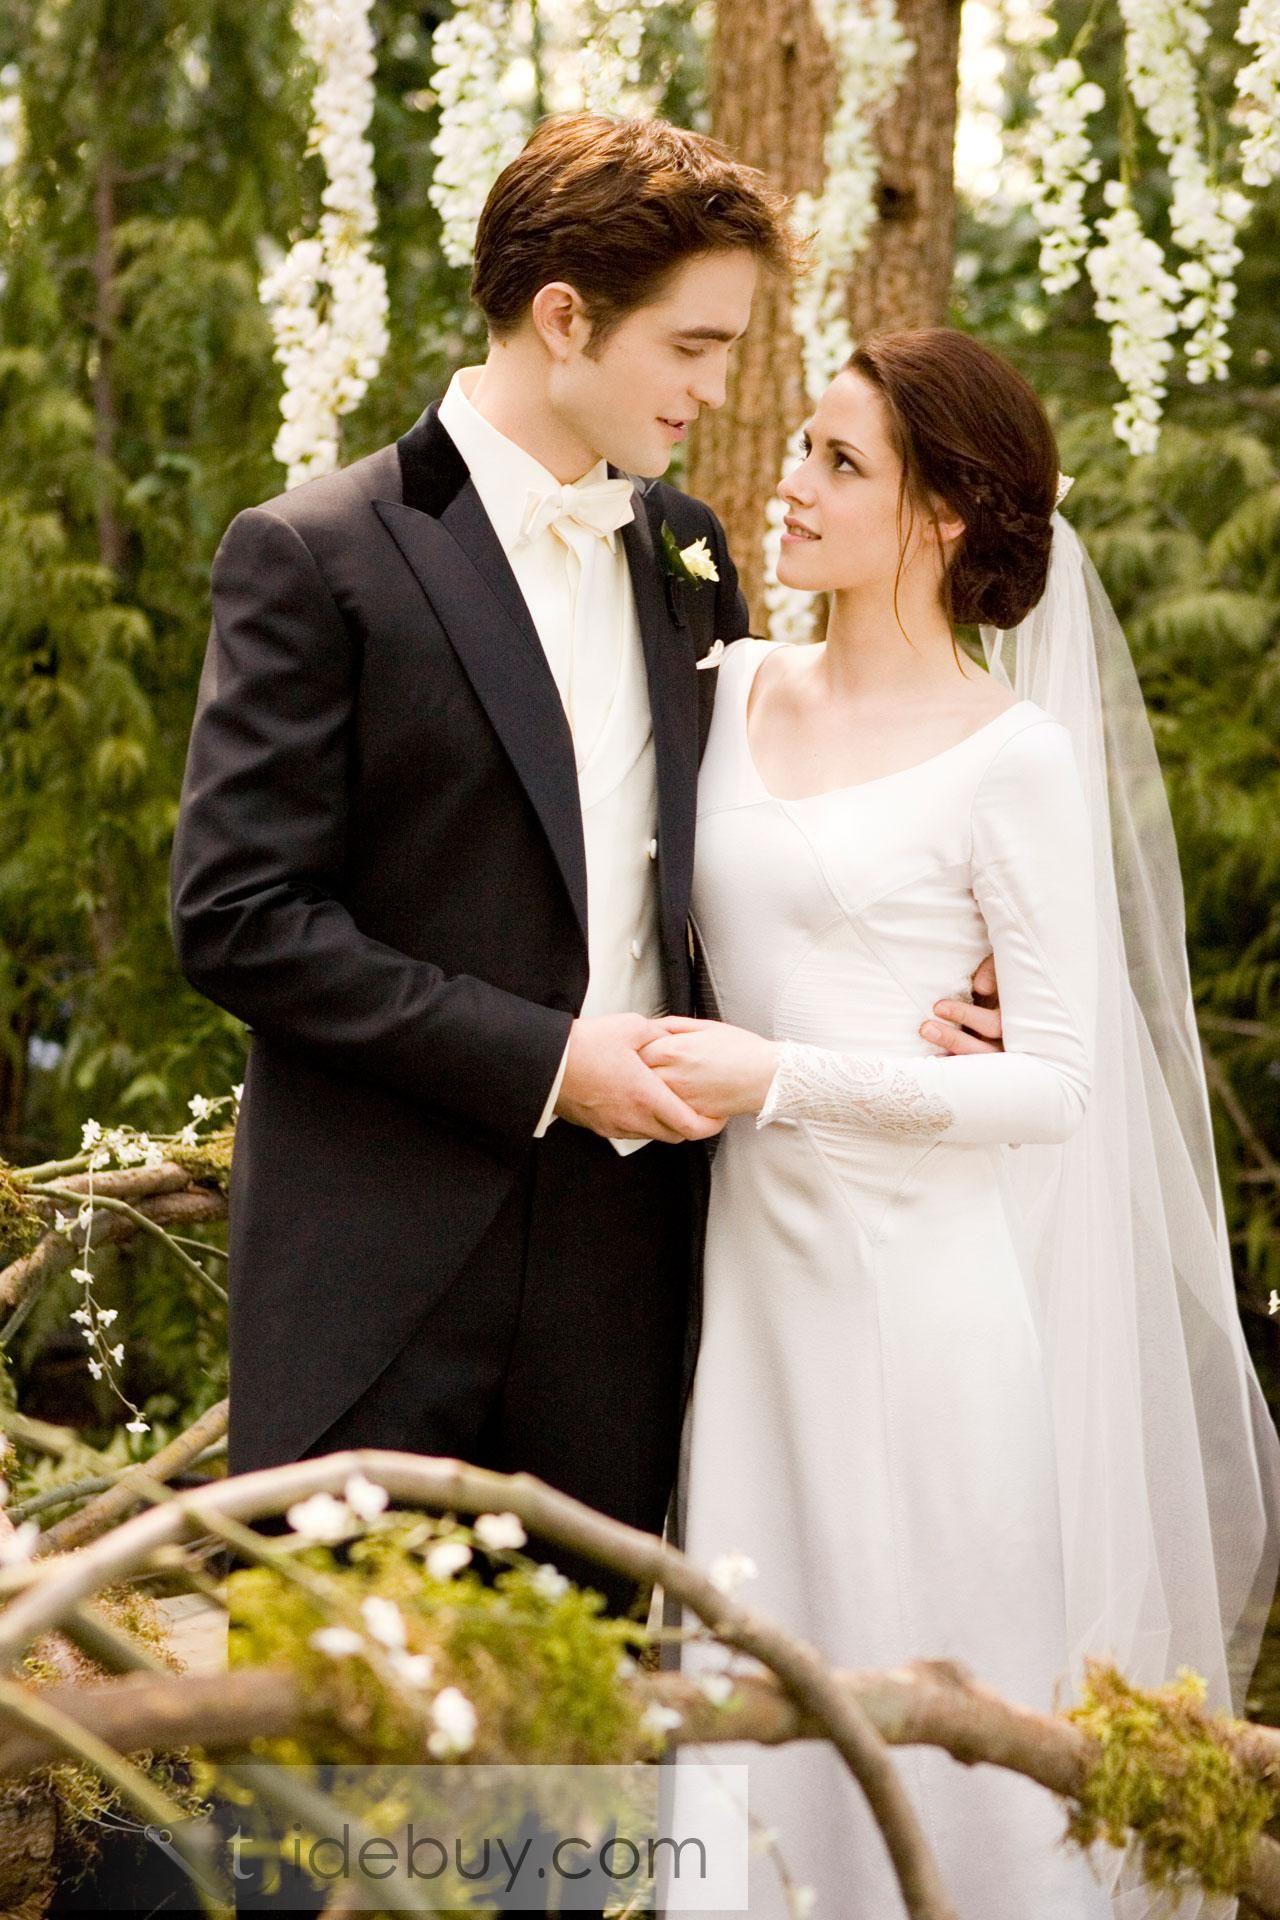 Bella's wedding dress in breaking dawn  Gorgeous SheathColumn Vneck LongSleeve Wedding Dresses Inspired